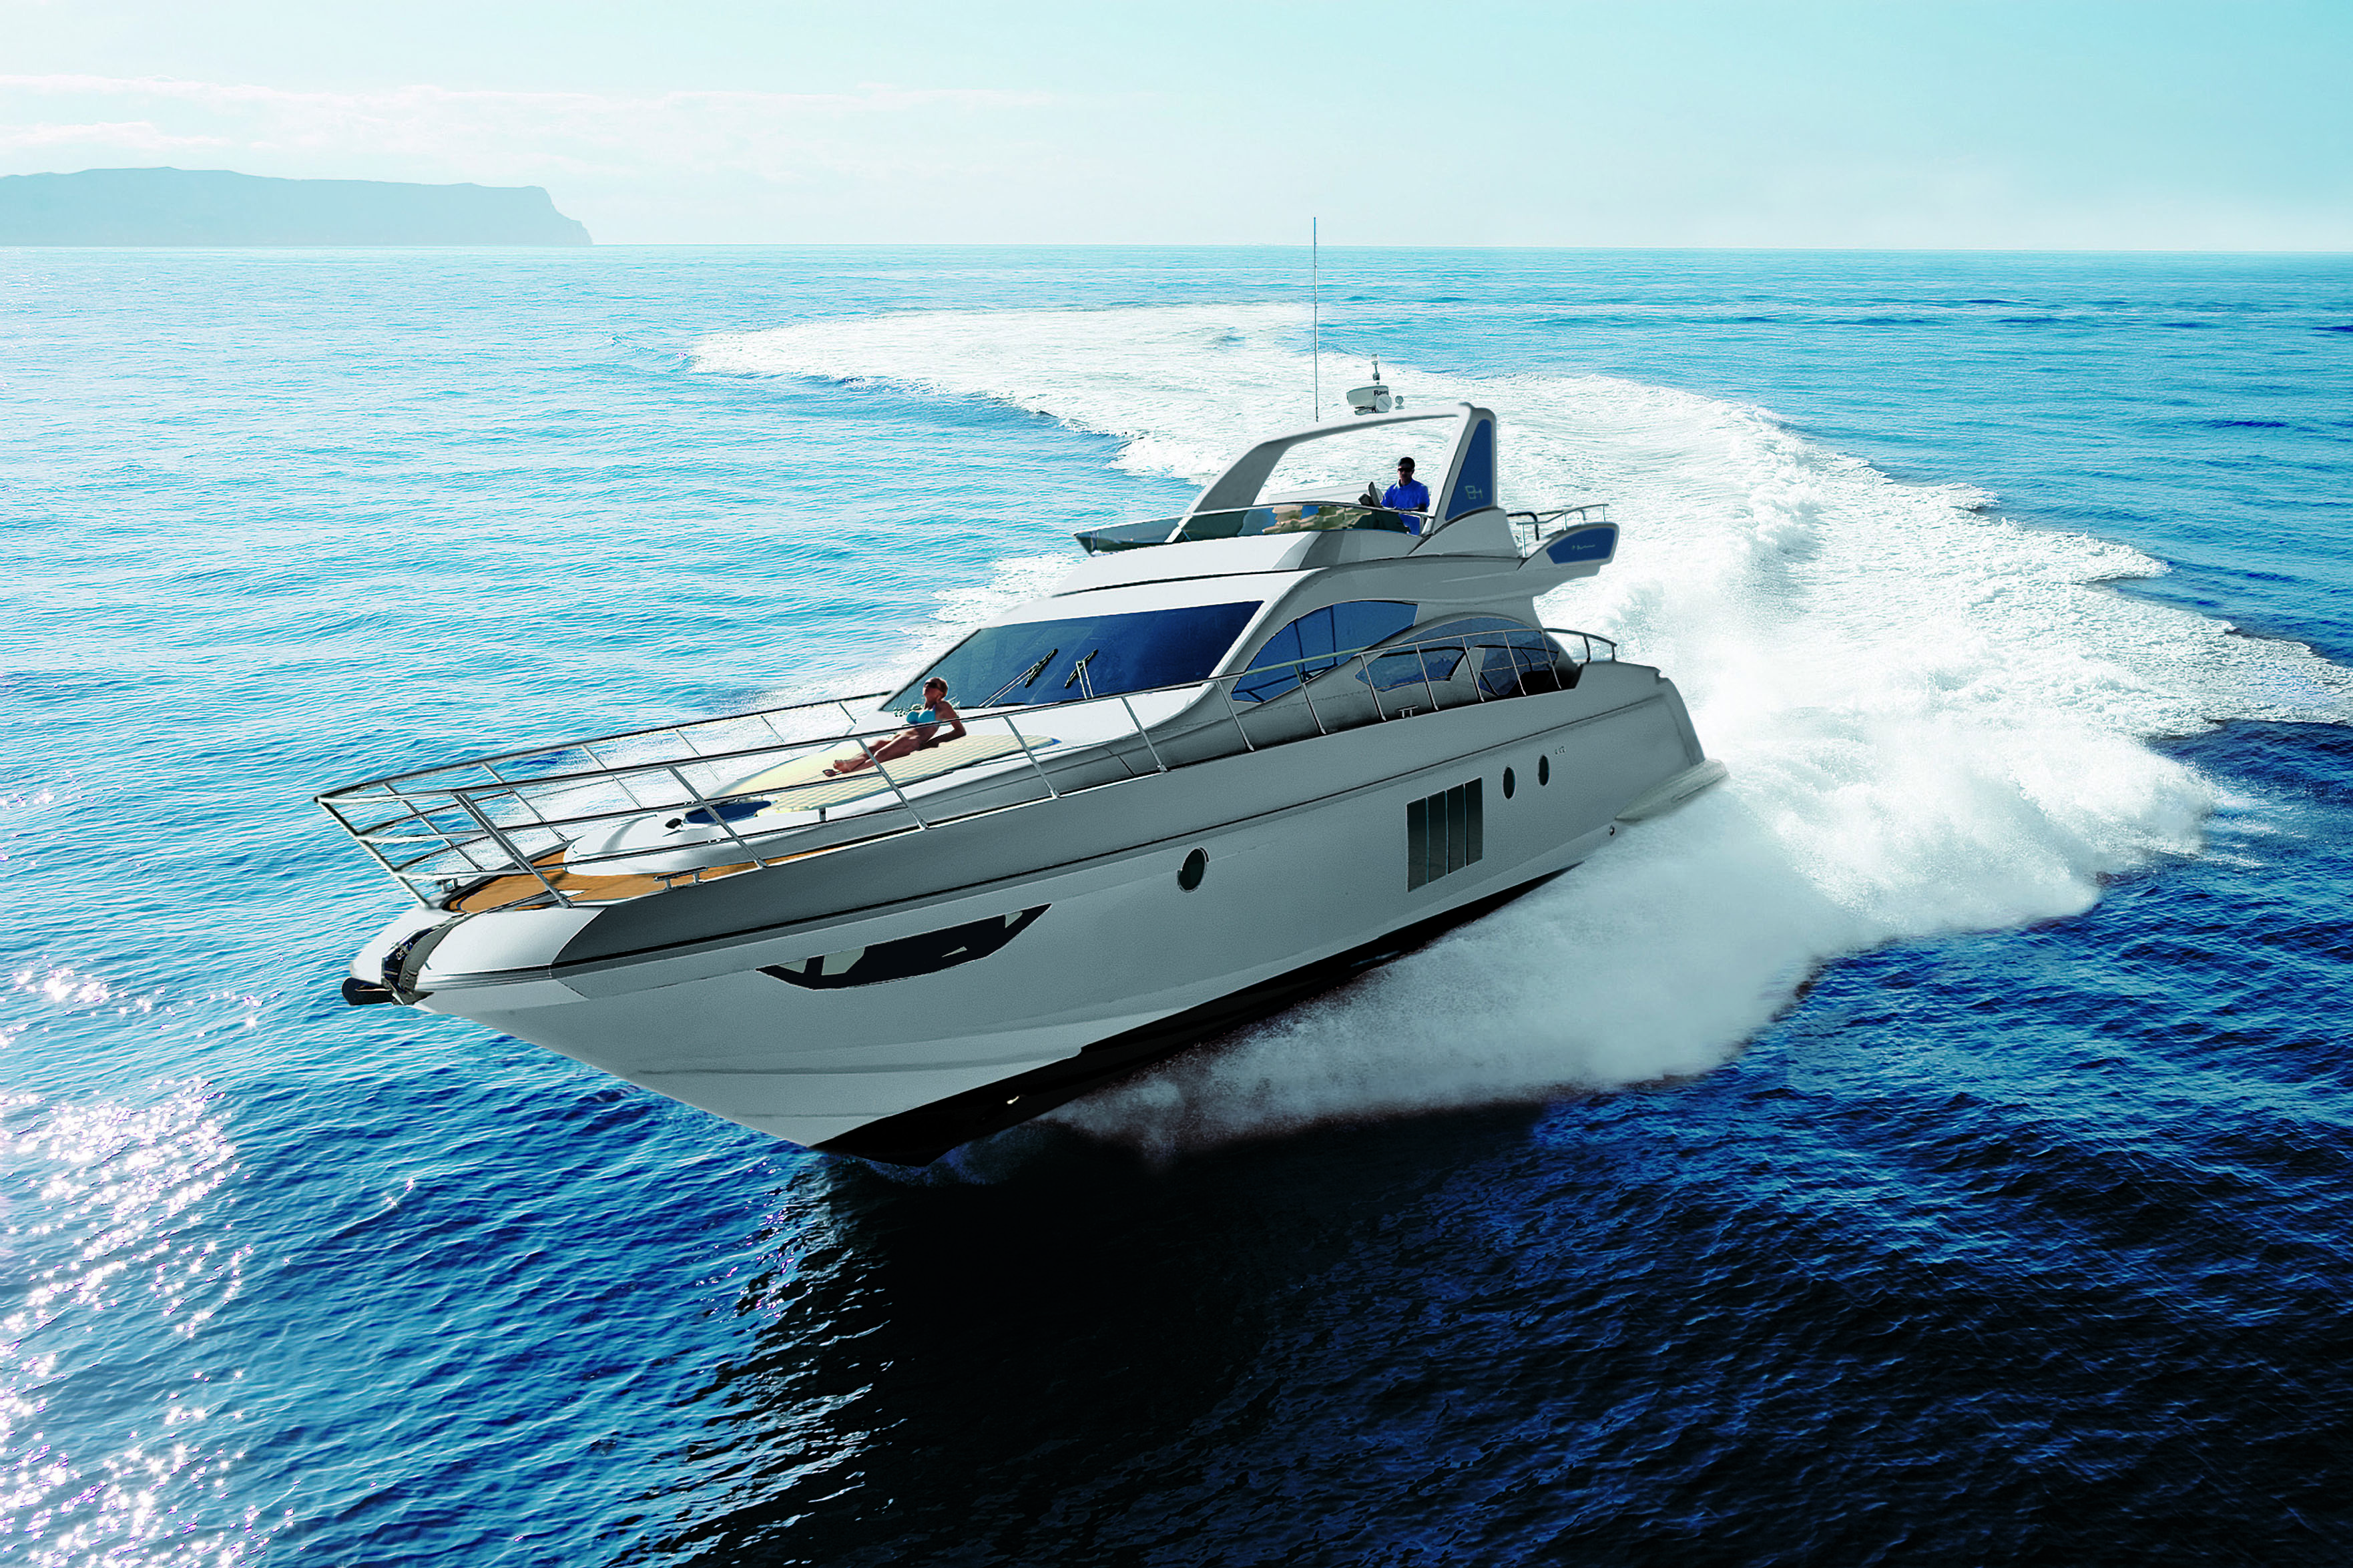 azimut 64 running 4 yacht charter superyacht news. Black Bedroom Furniture Sets. Home Design Ideas